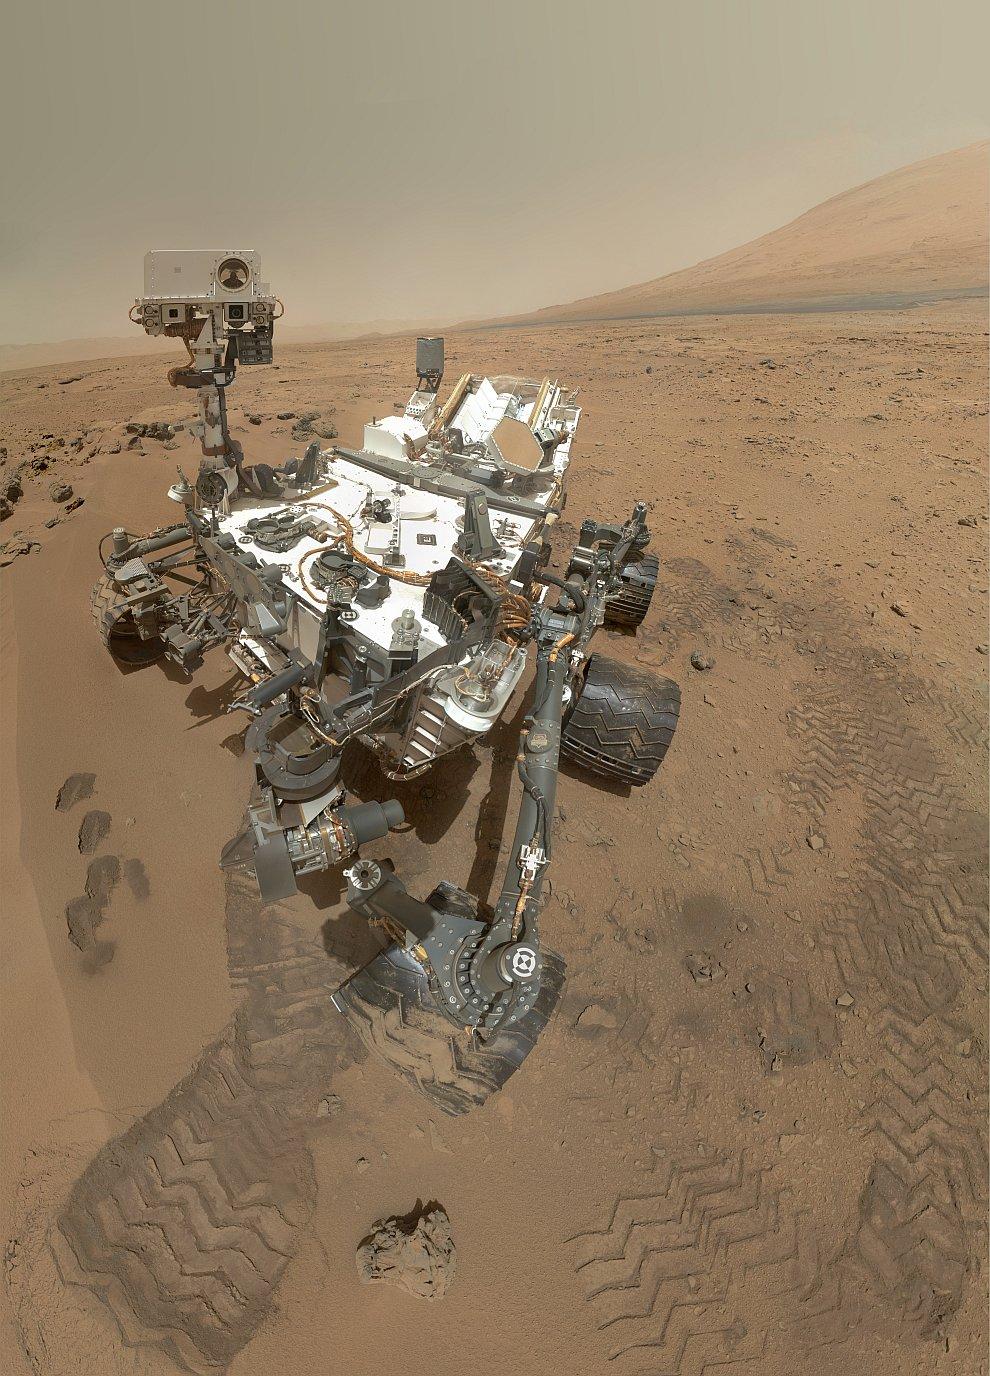 Автопортрет марсохода Curiosity на поверхности Марса